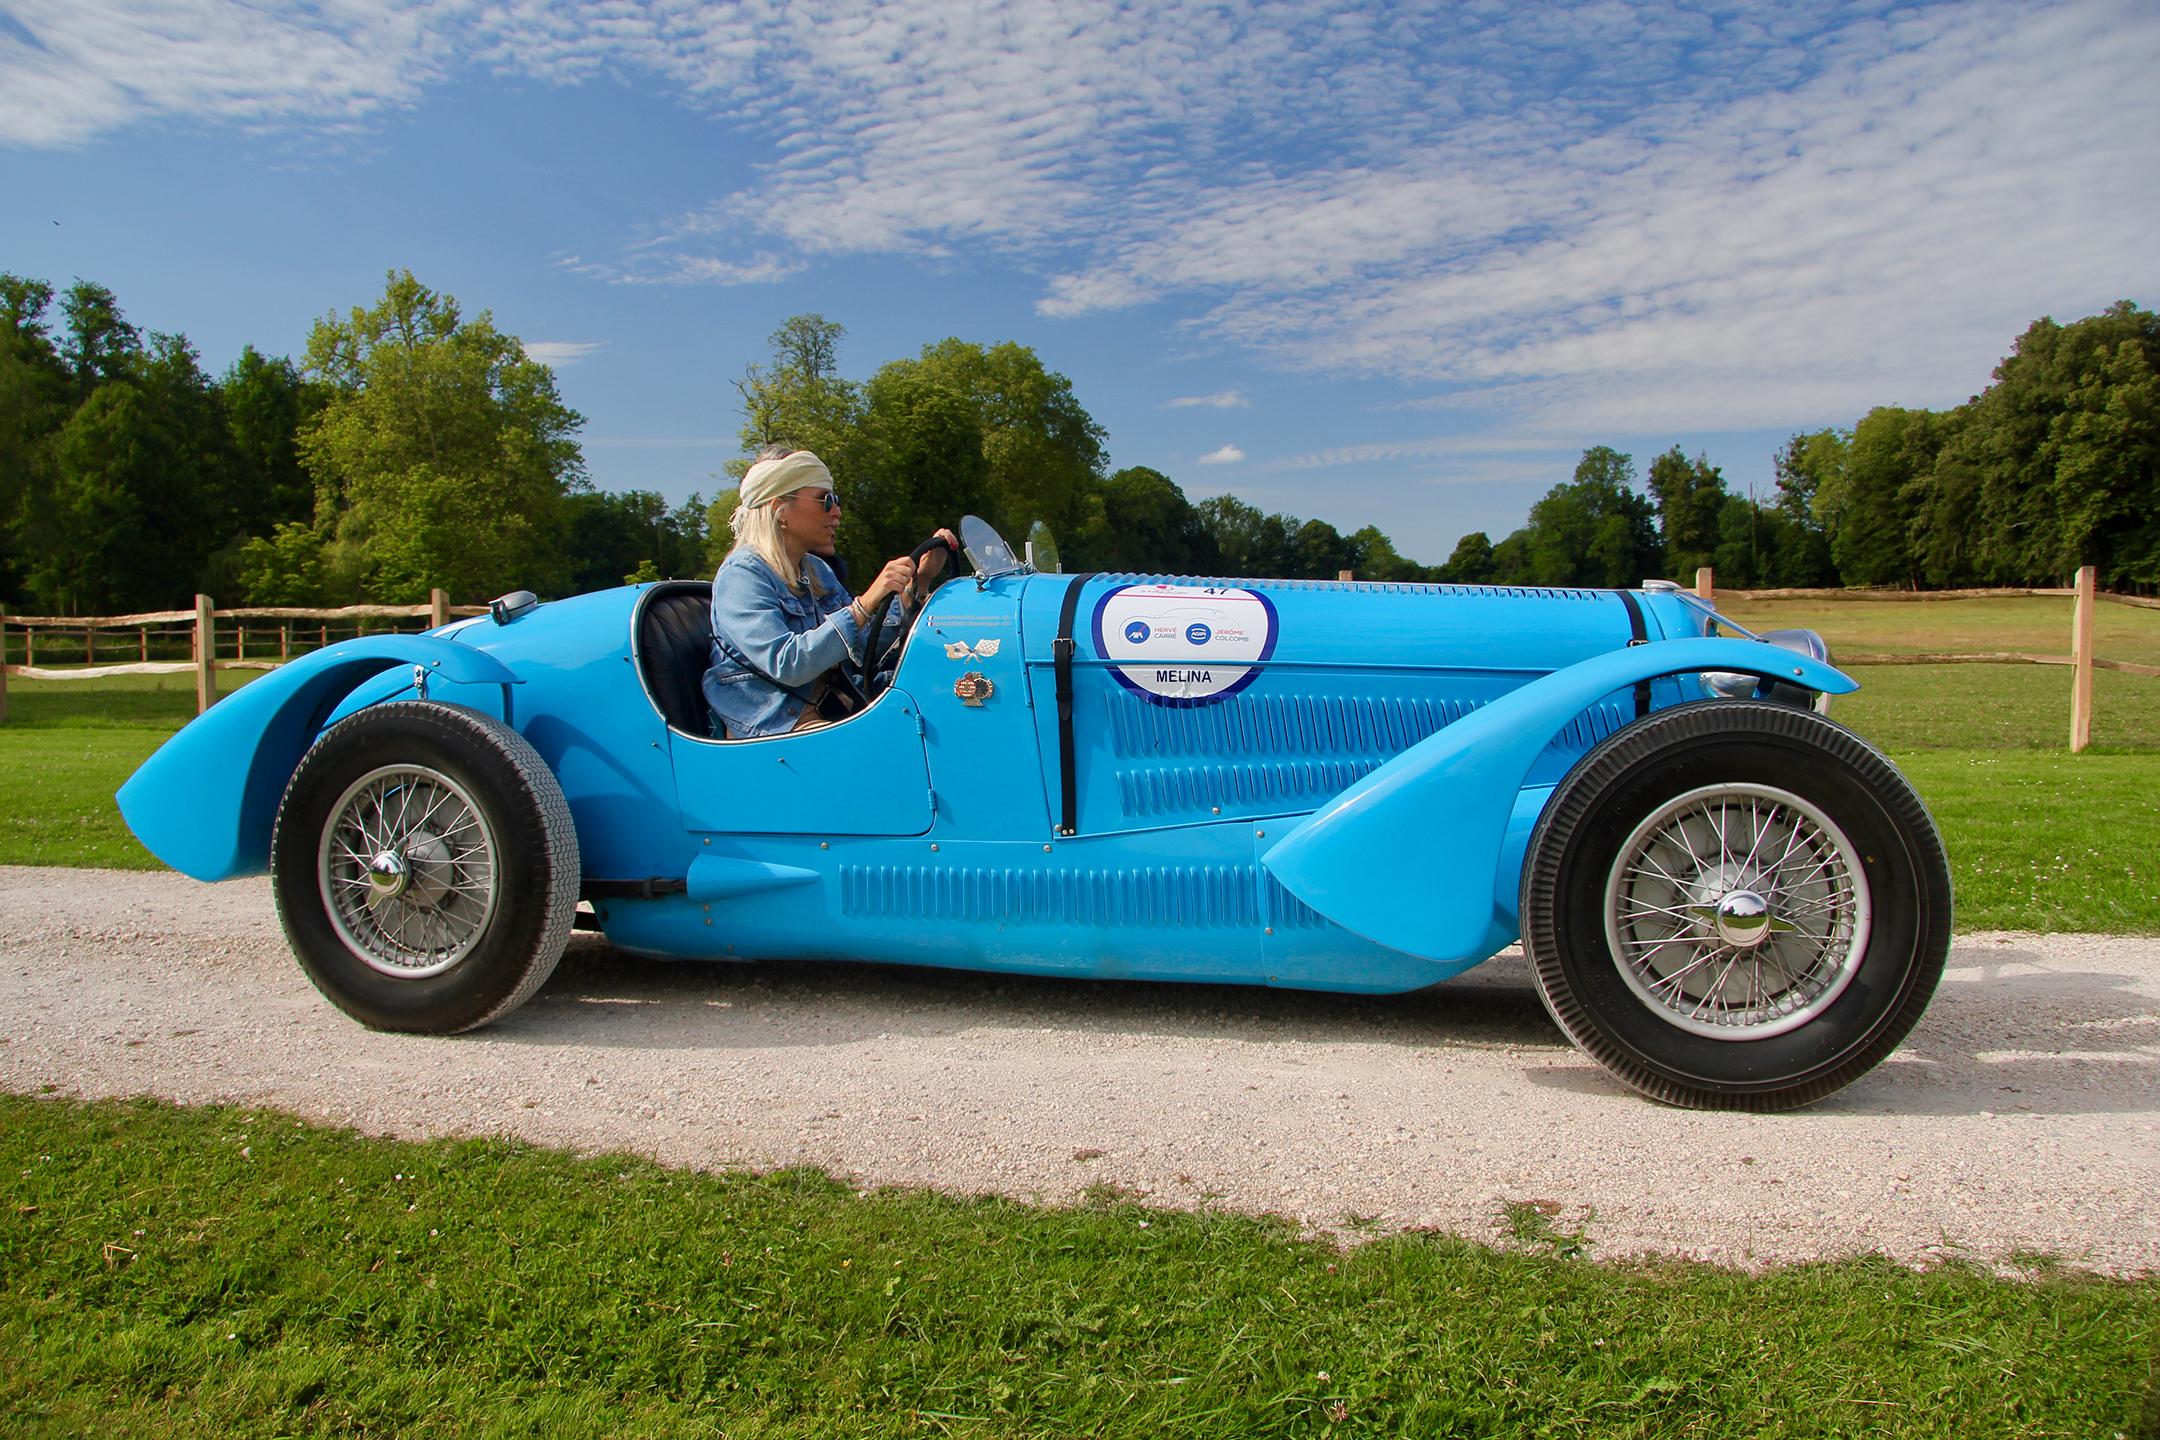 Delahaye 135 S Type Le Mans 1937 - Rallye du Coeur 2020 - photo Ludo Ferrari